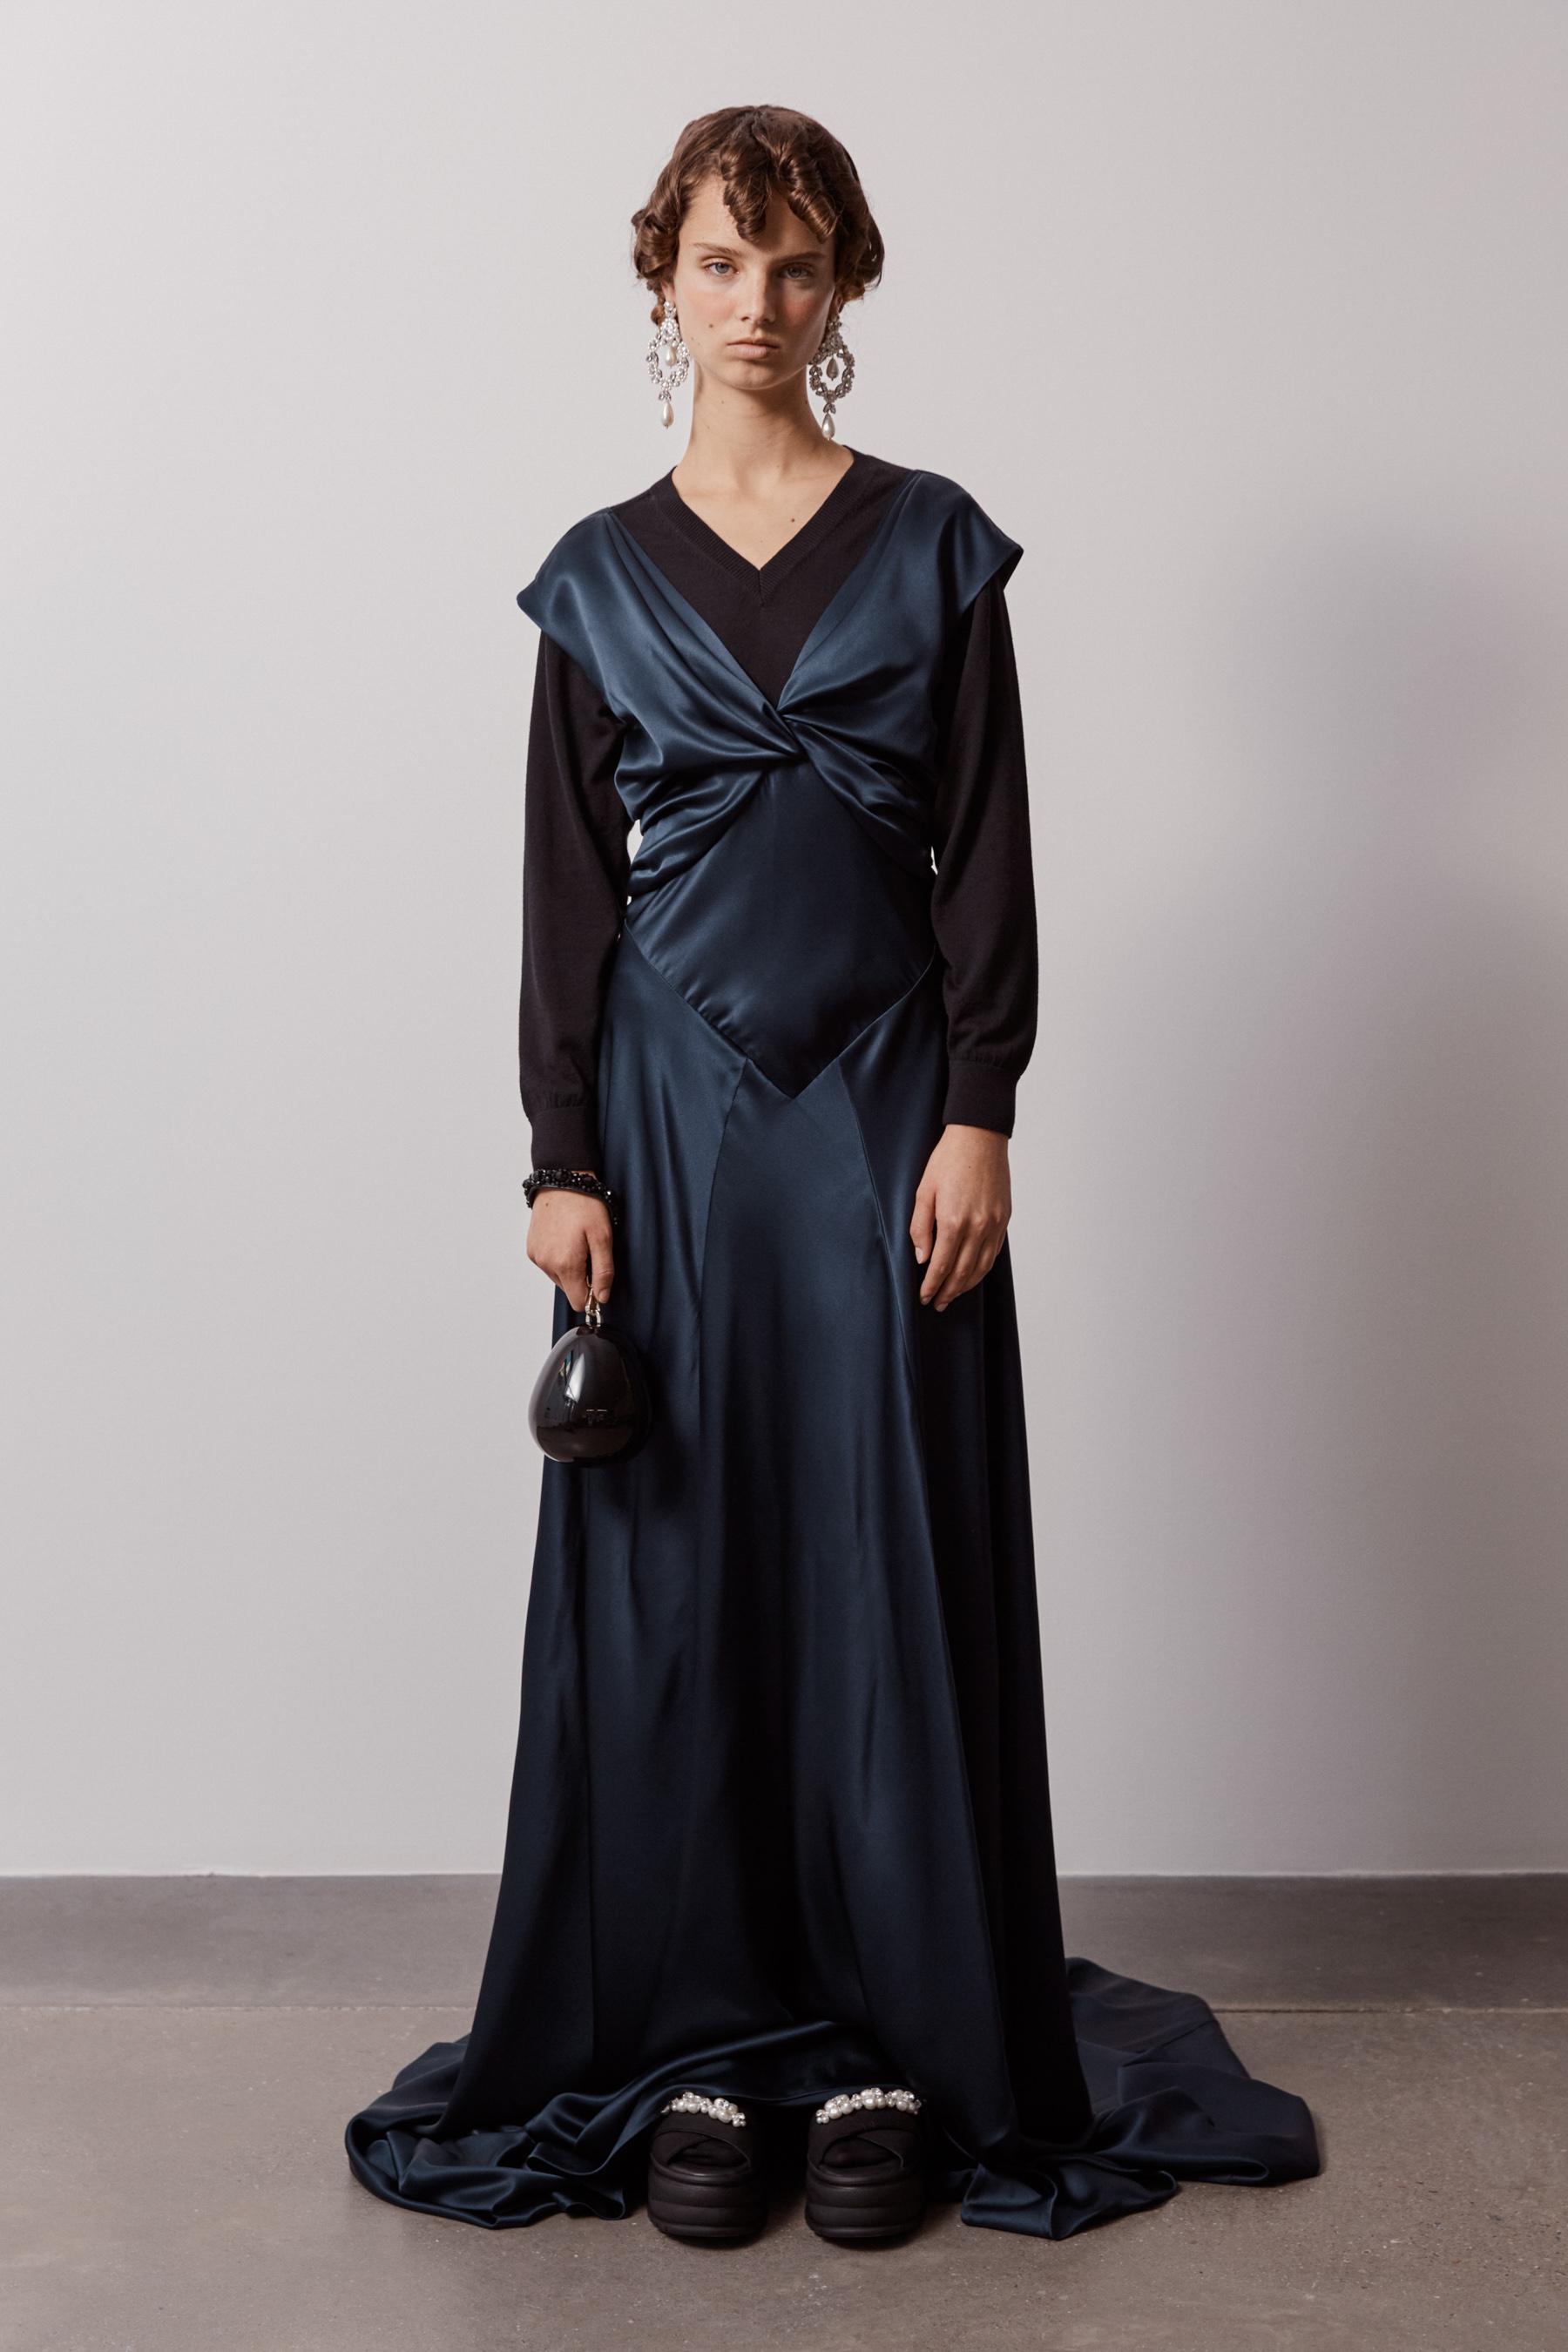 Simone Rocha Spring 2021 Fashion Show